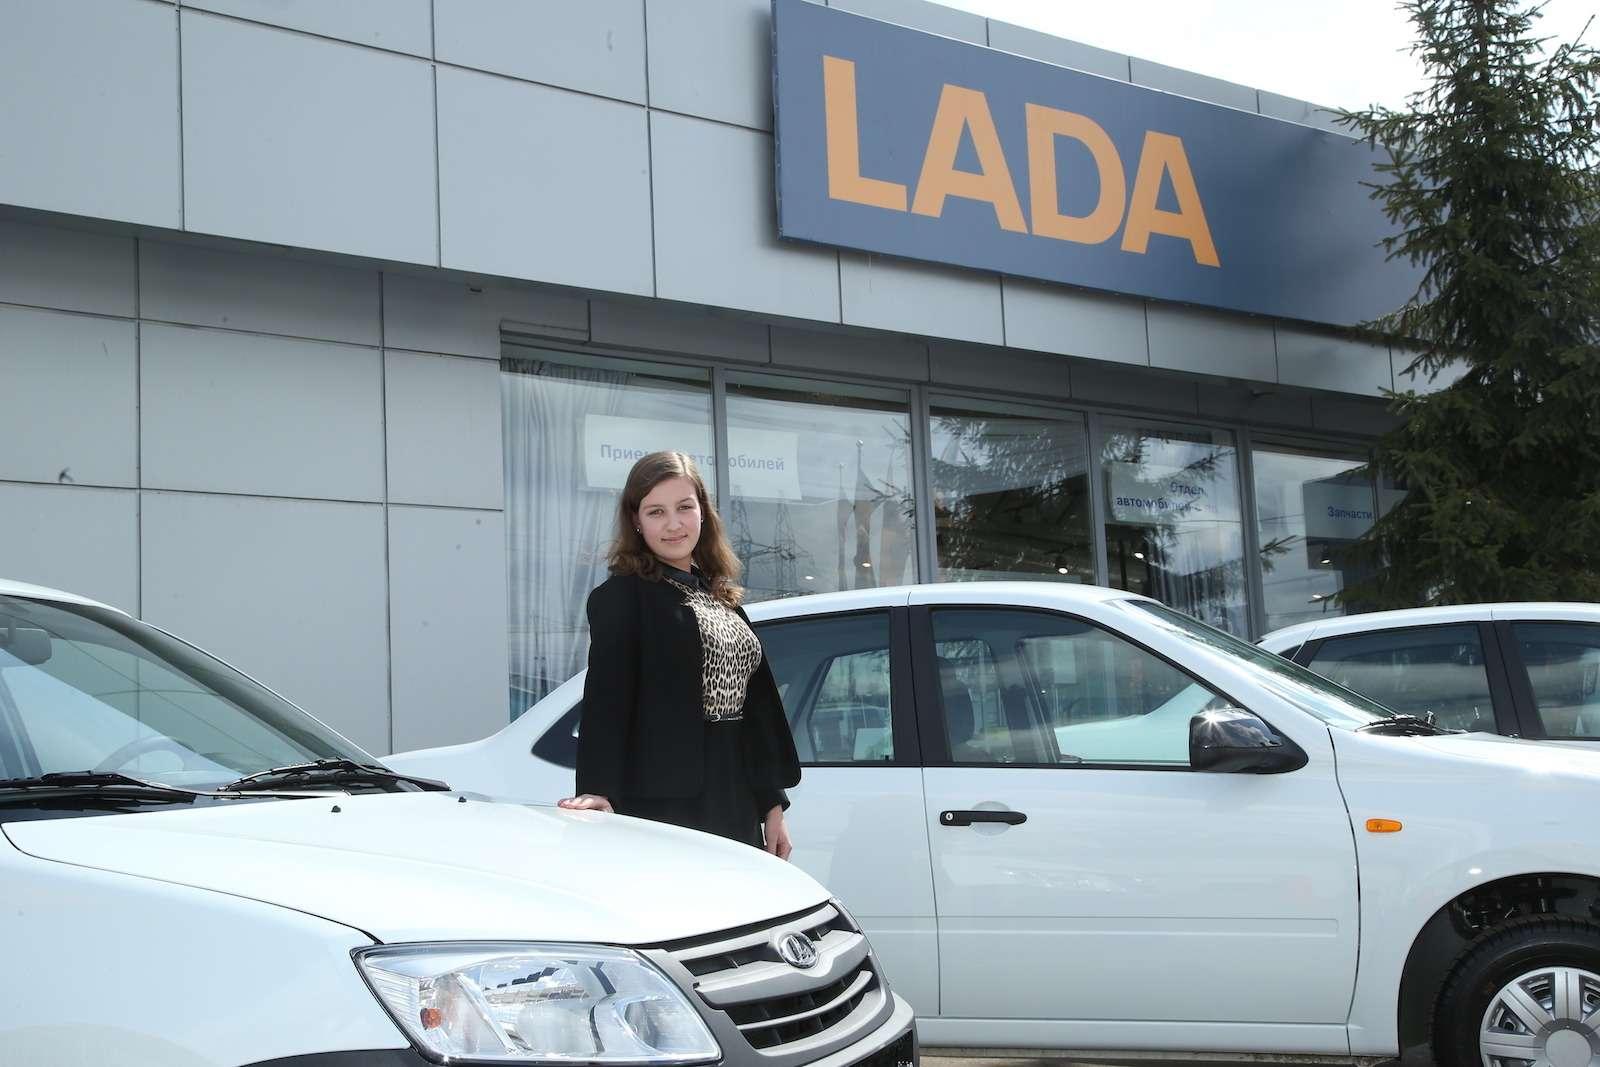 Гран-при «Зарулем»: ключи оттрех Lada Granta переданы победителям— фото 580062